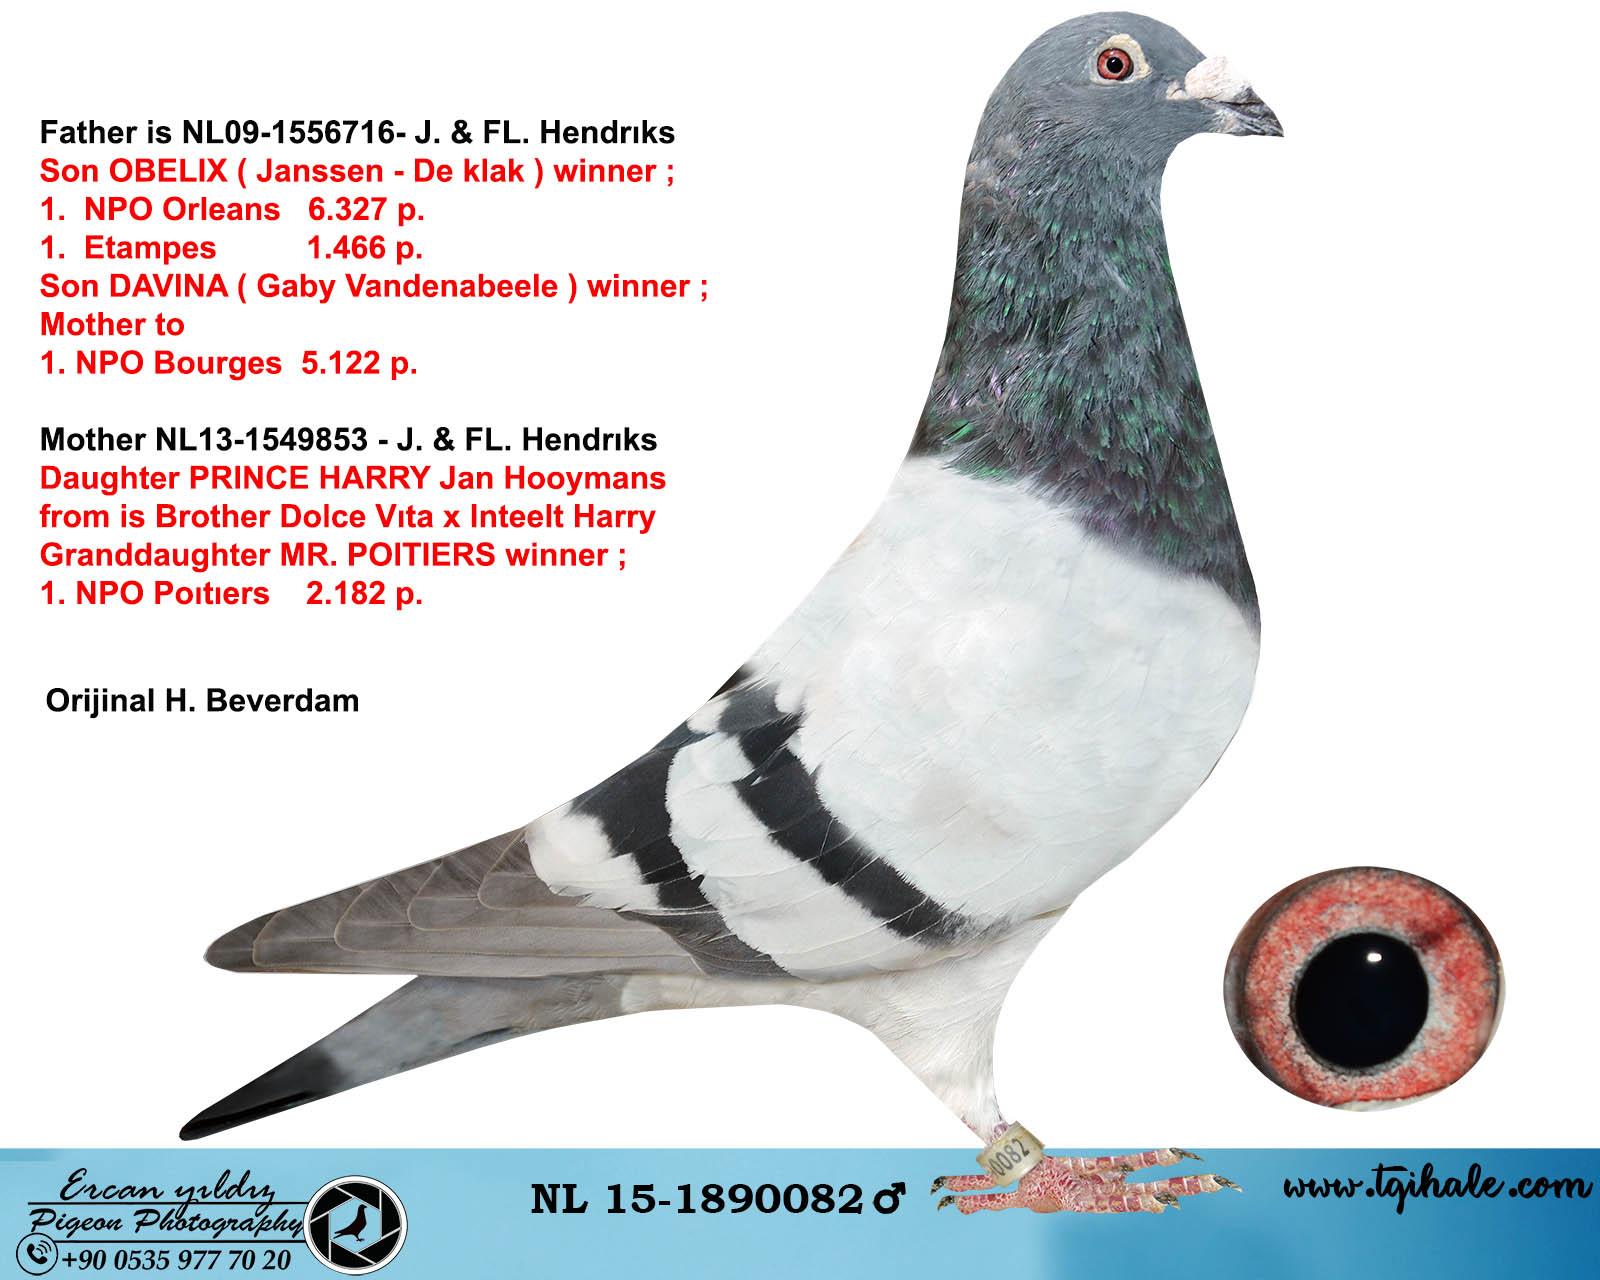 NL15-1890082 ERKEK / DEDESİ OBELIX  1. NPO ORLEANS  6.327  P. / ANNE HATTI HARRY